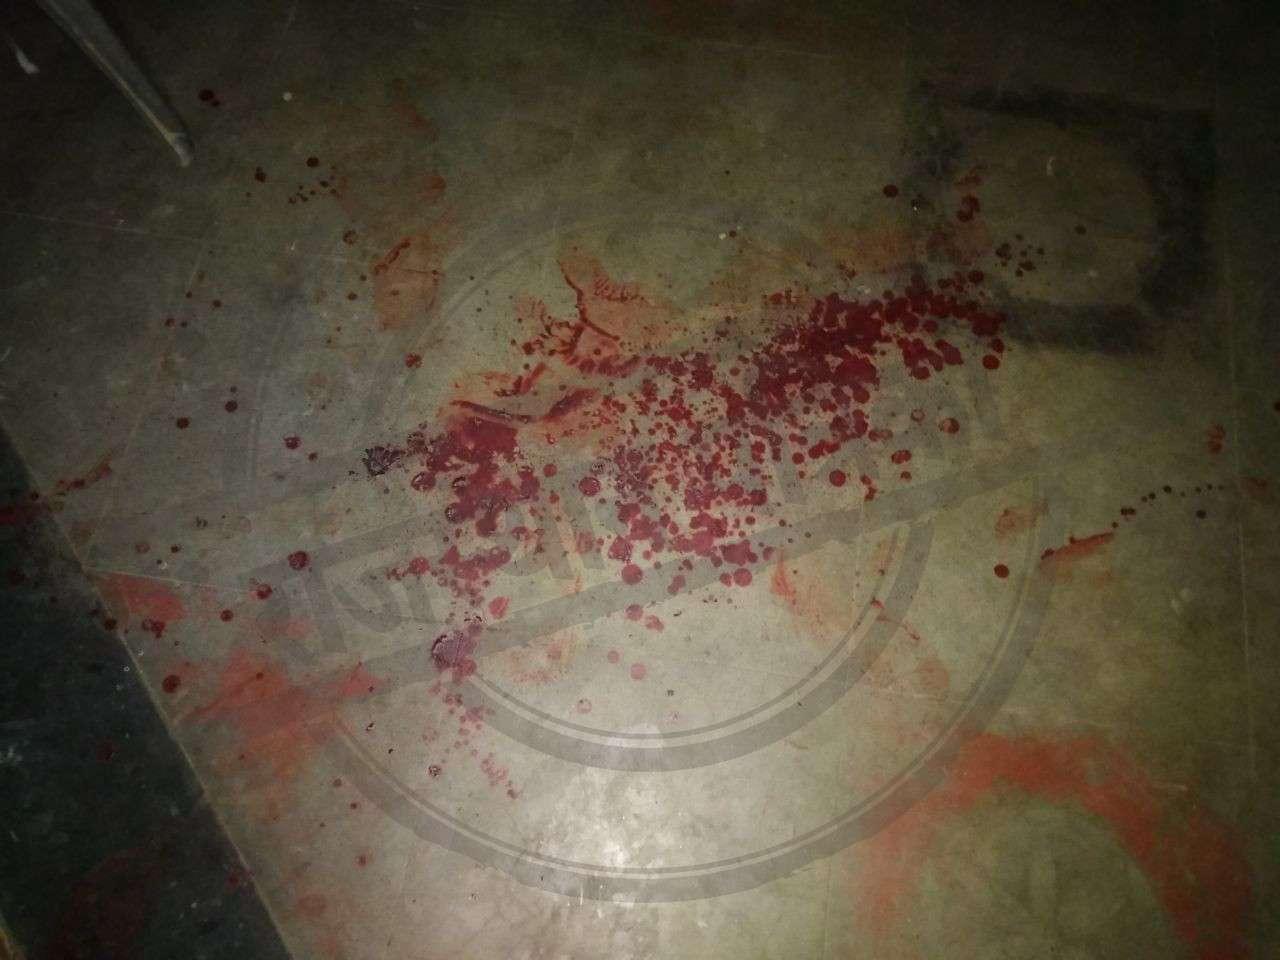 son in law attack wife family in Ajitgarh sikar